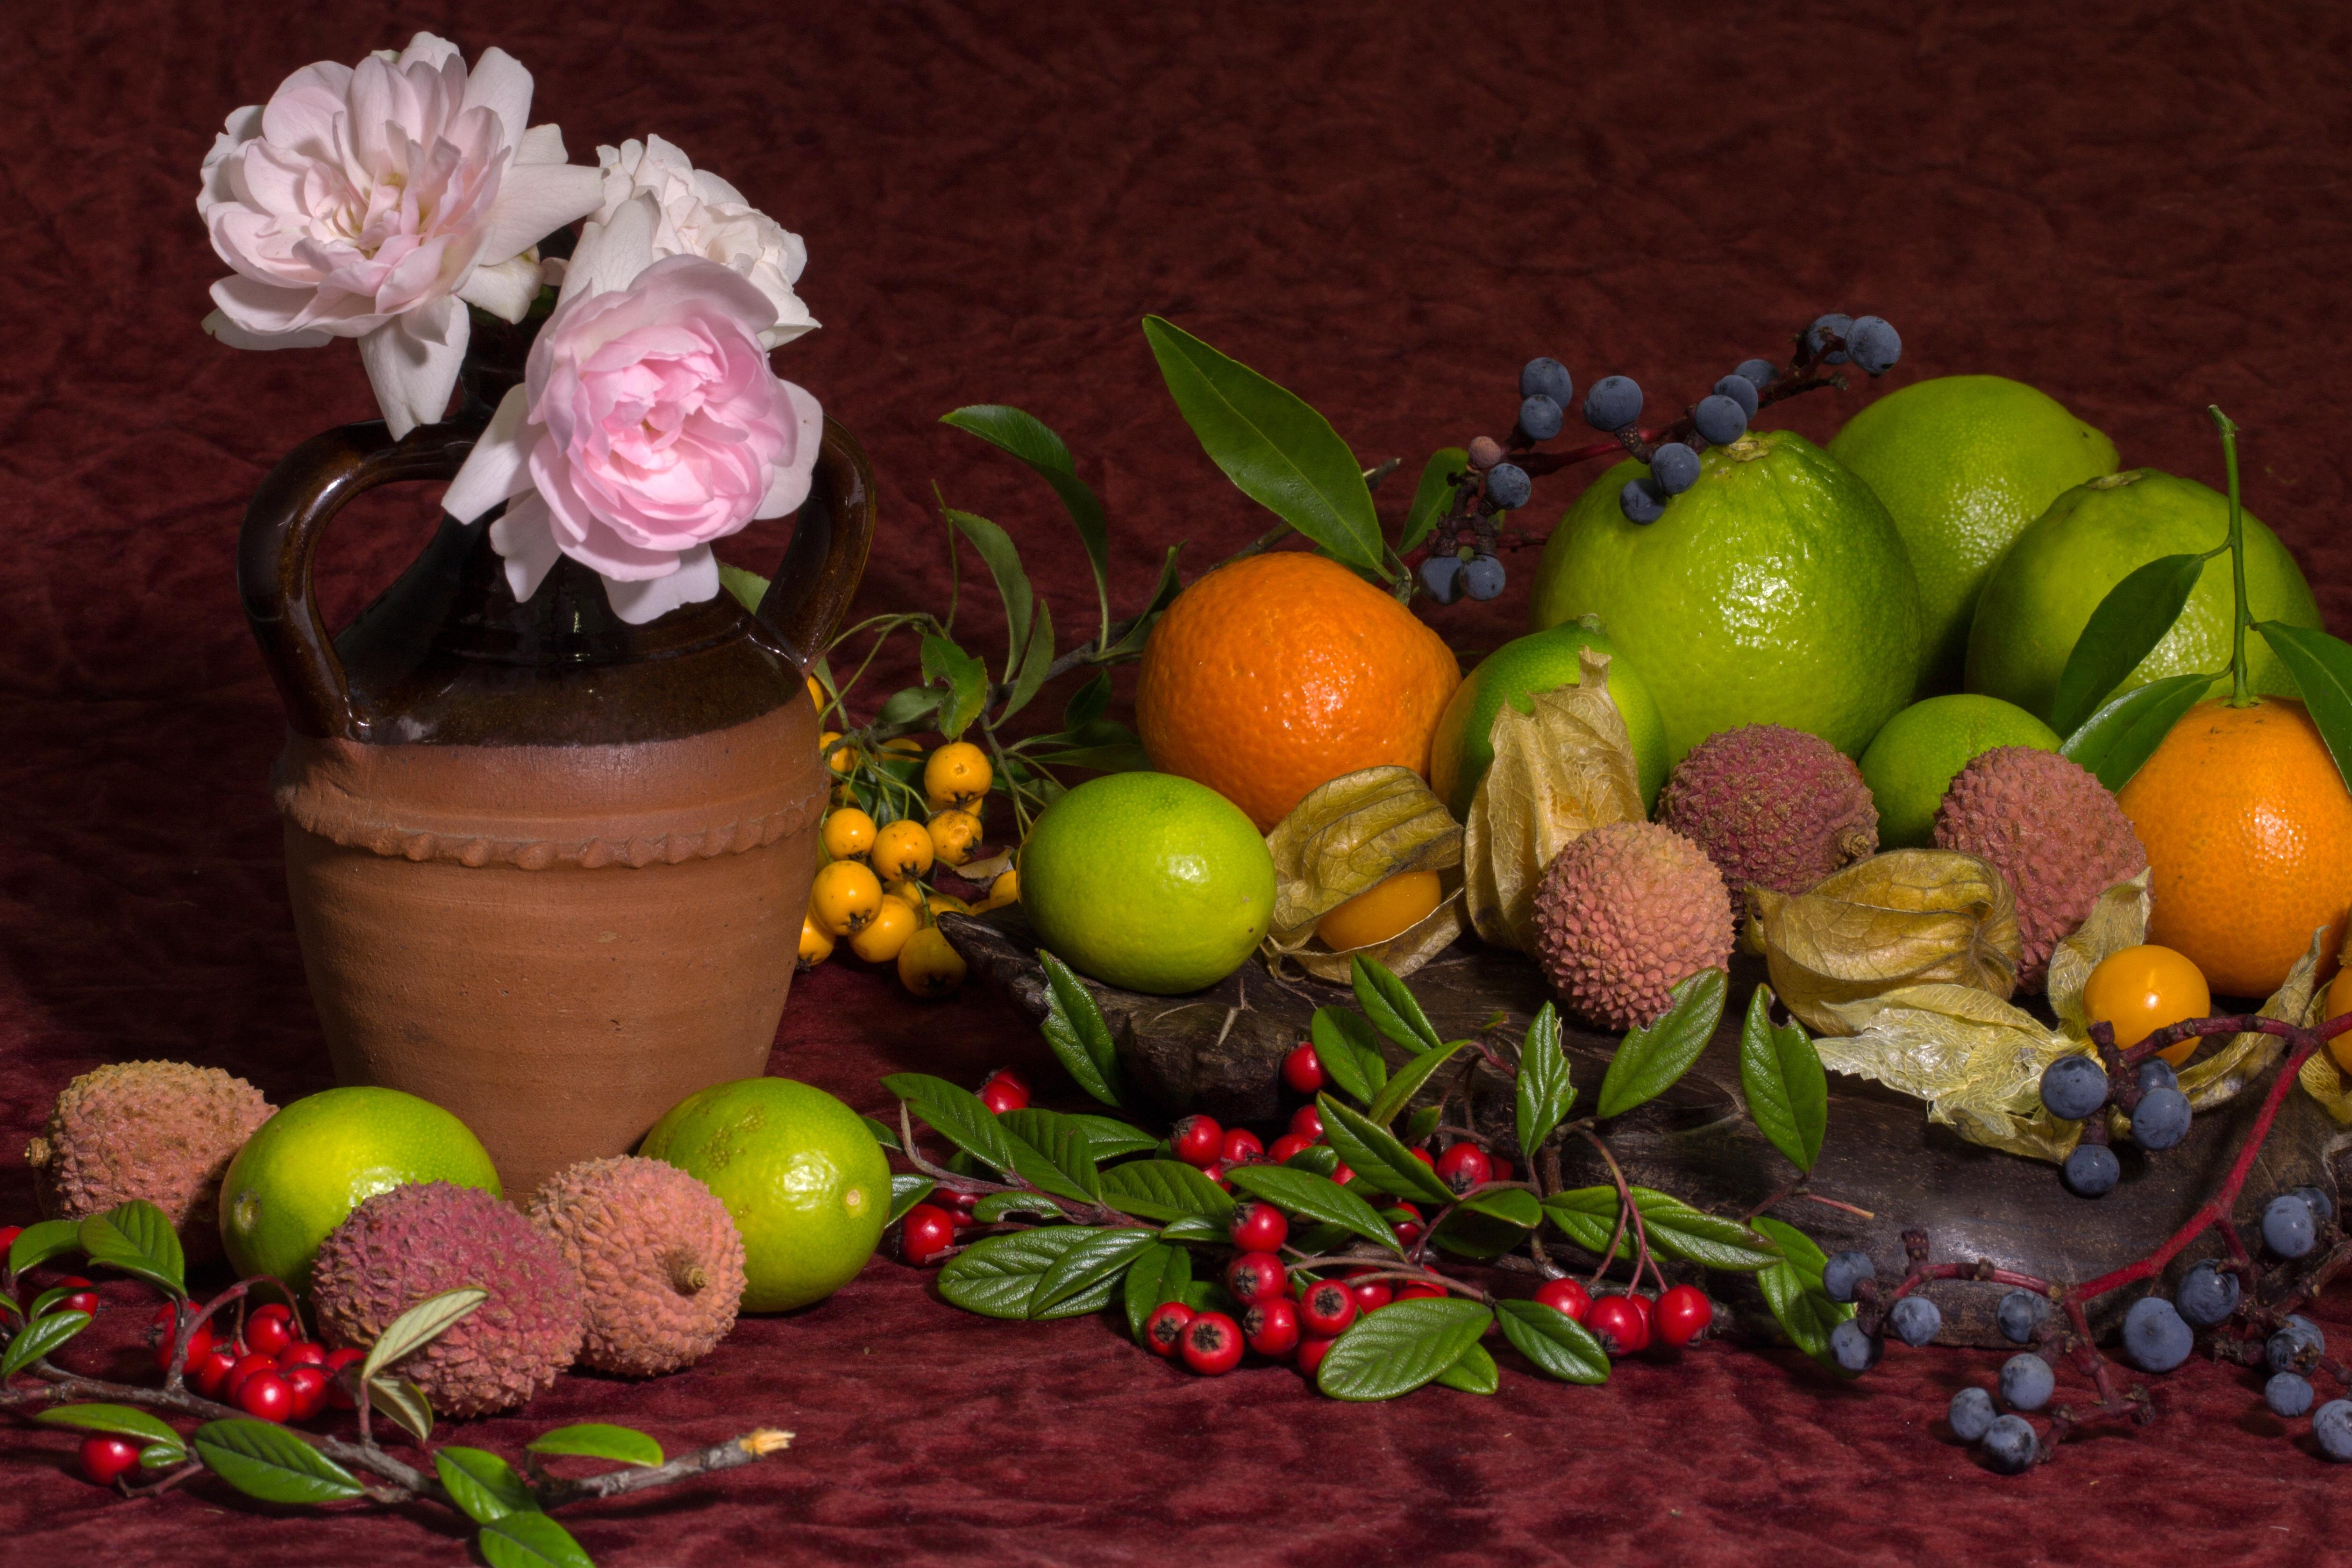 картинки с фруктами и цветами фото принципе, можно